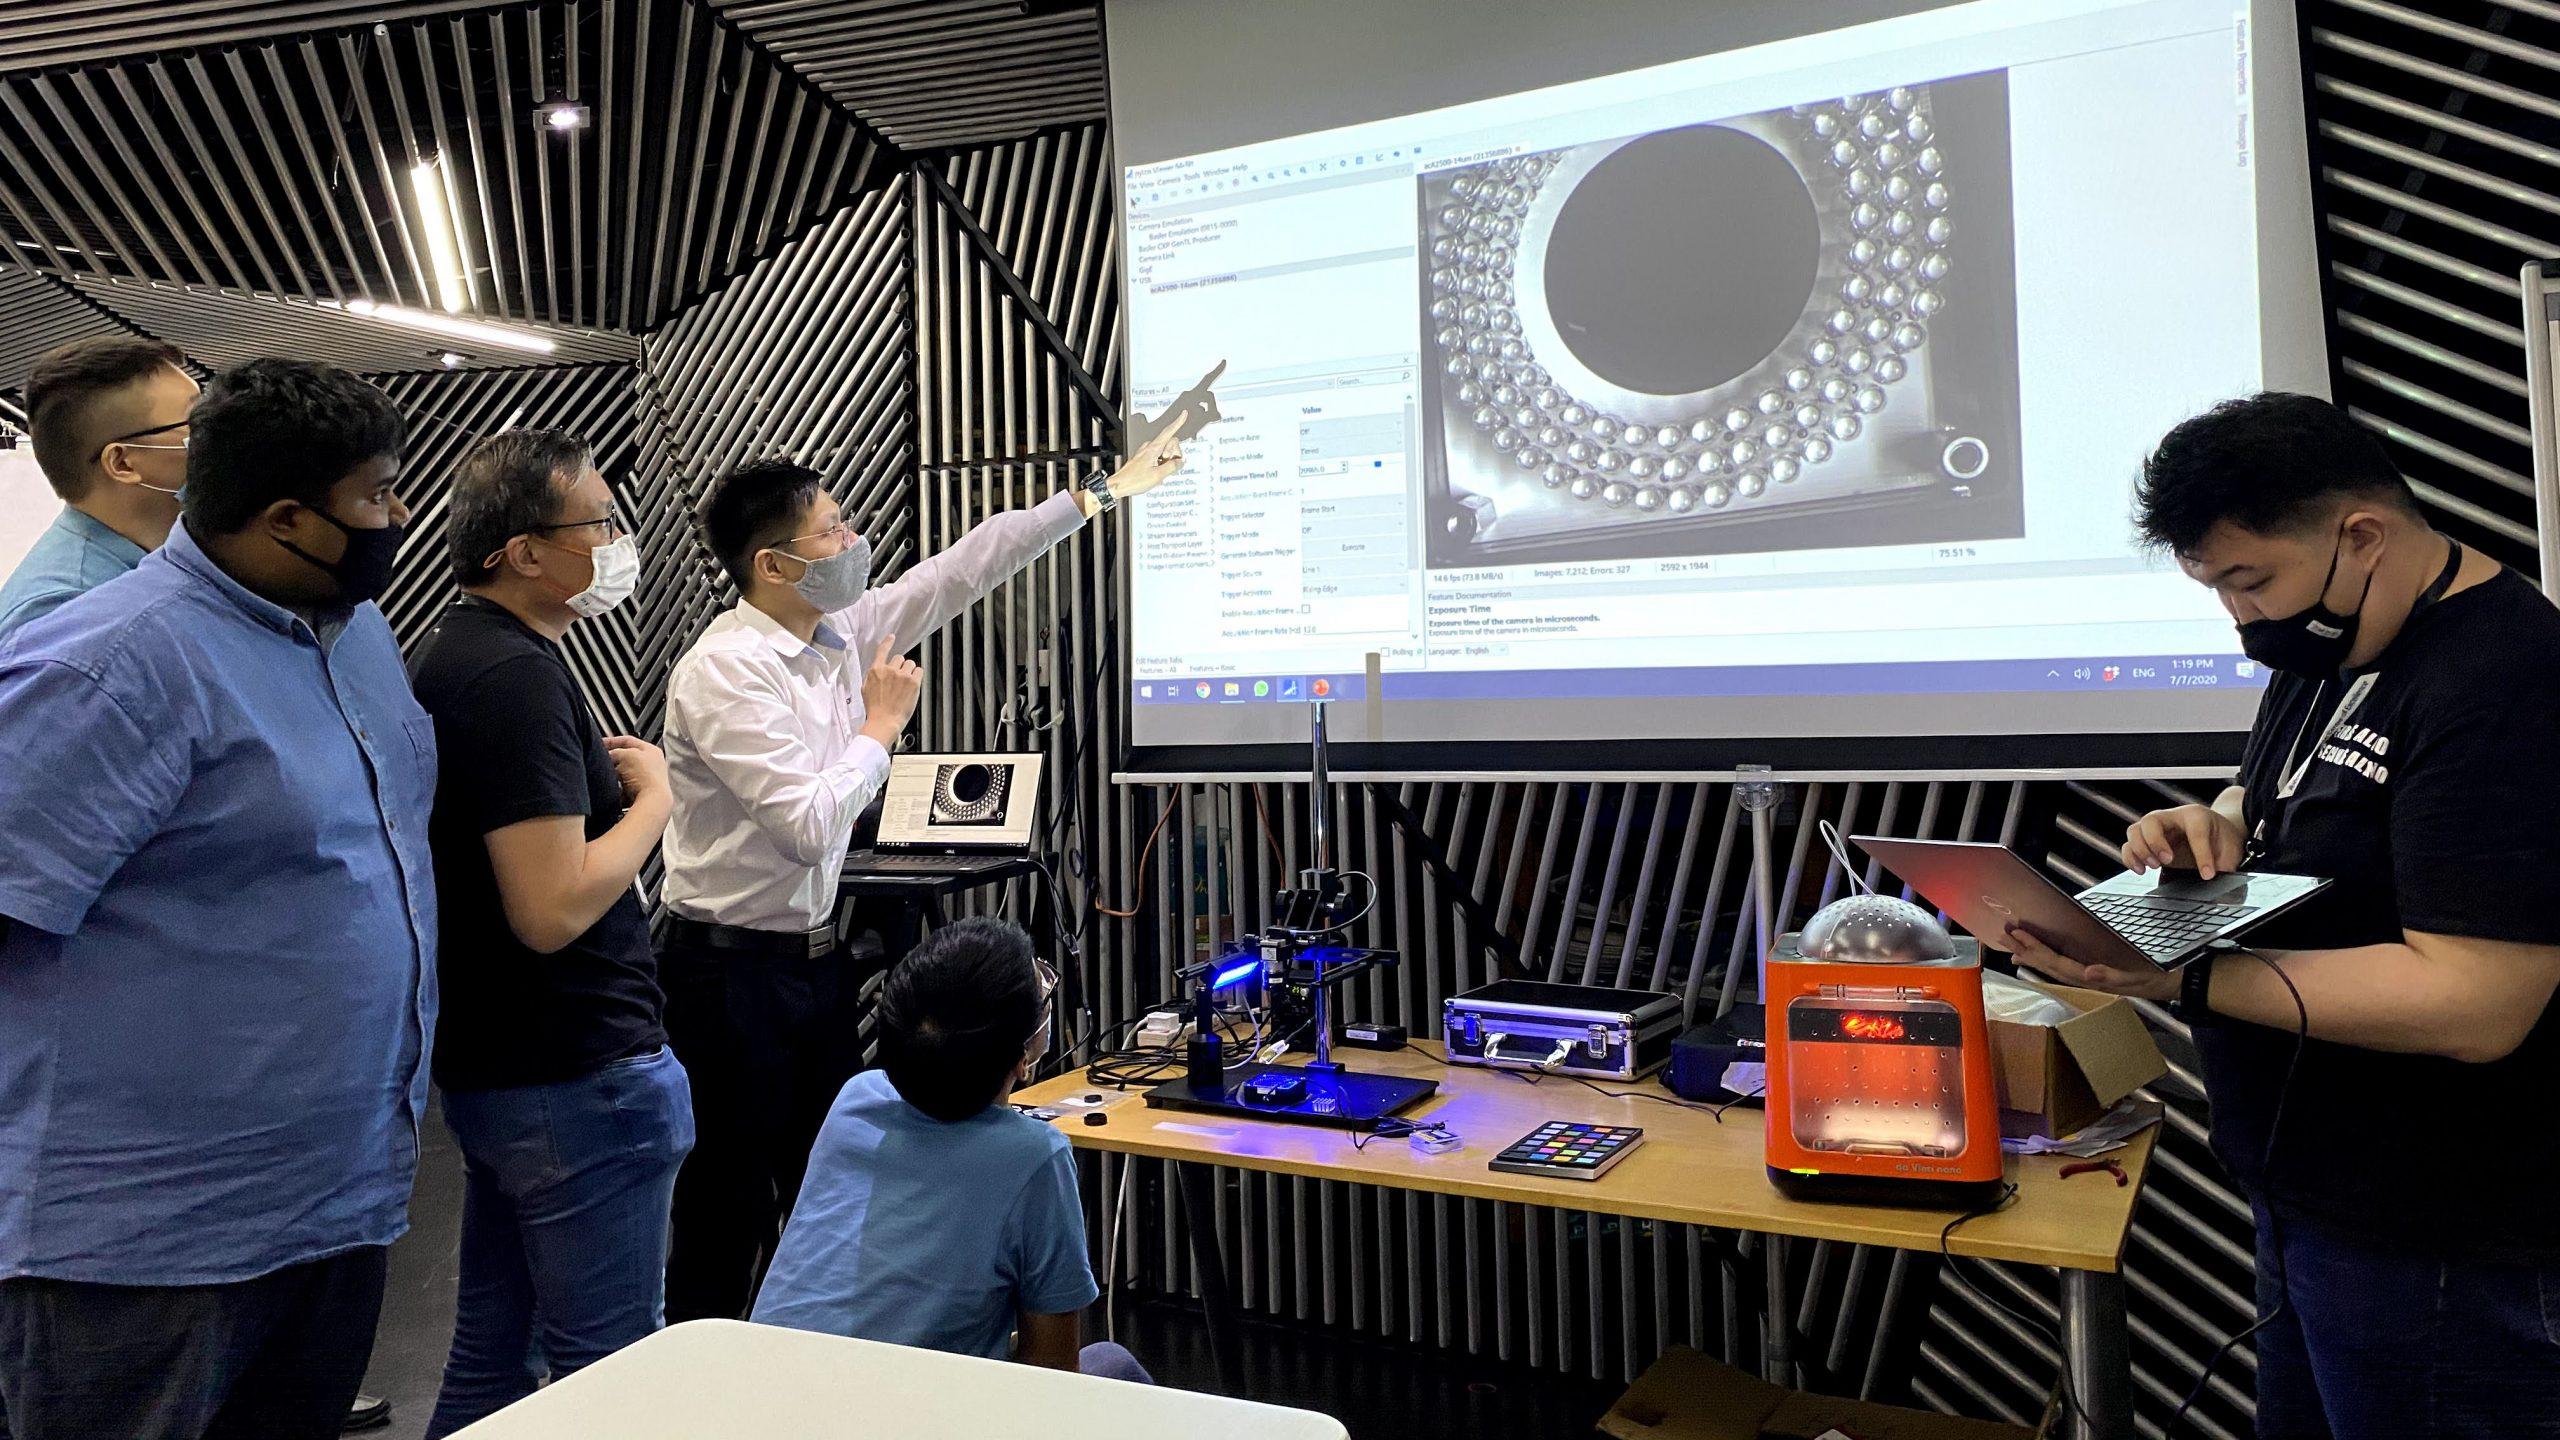 sodavision-machinevision-racerobotics-educationprogram